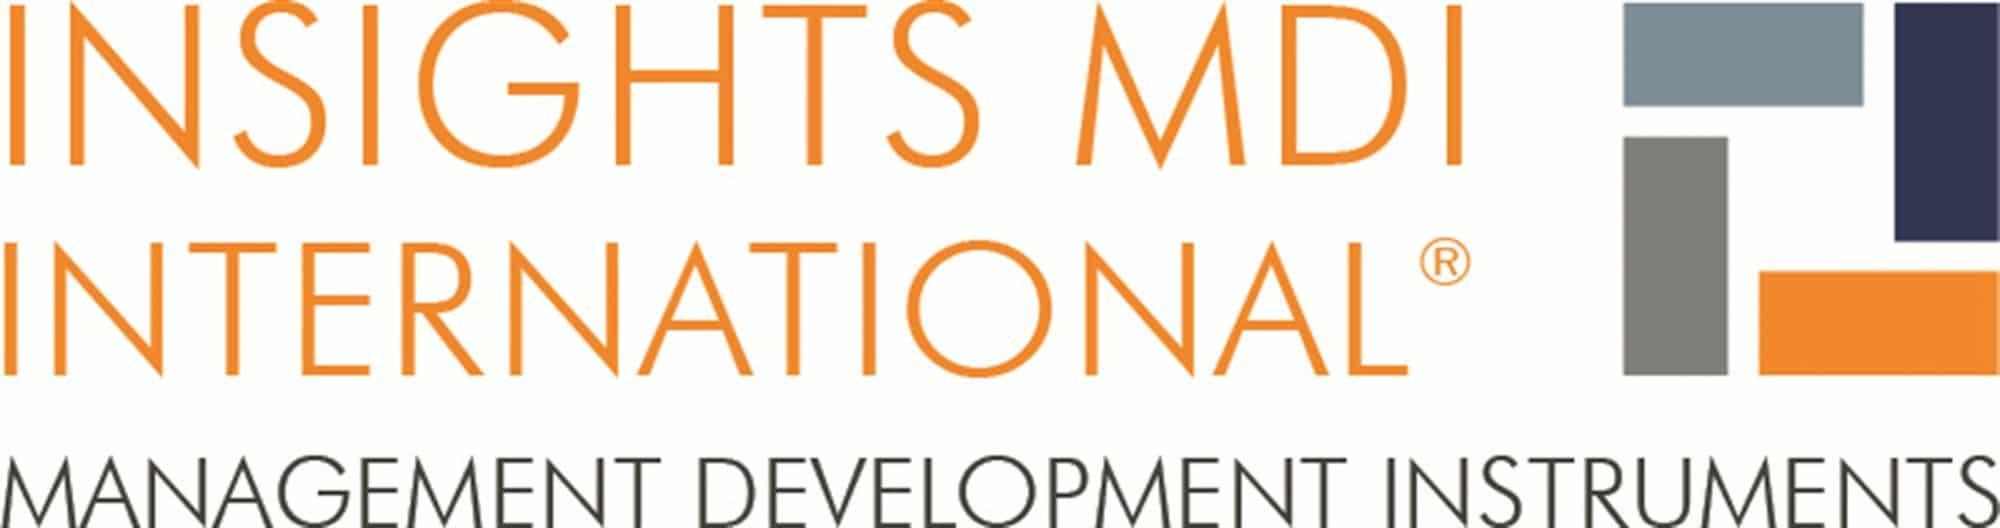 Logo INSIGHTS MDI® - Potentialanalyse mit Markus Euler